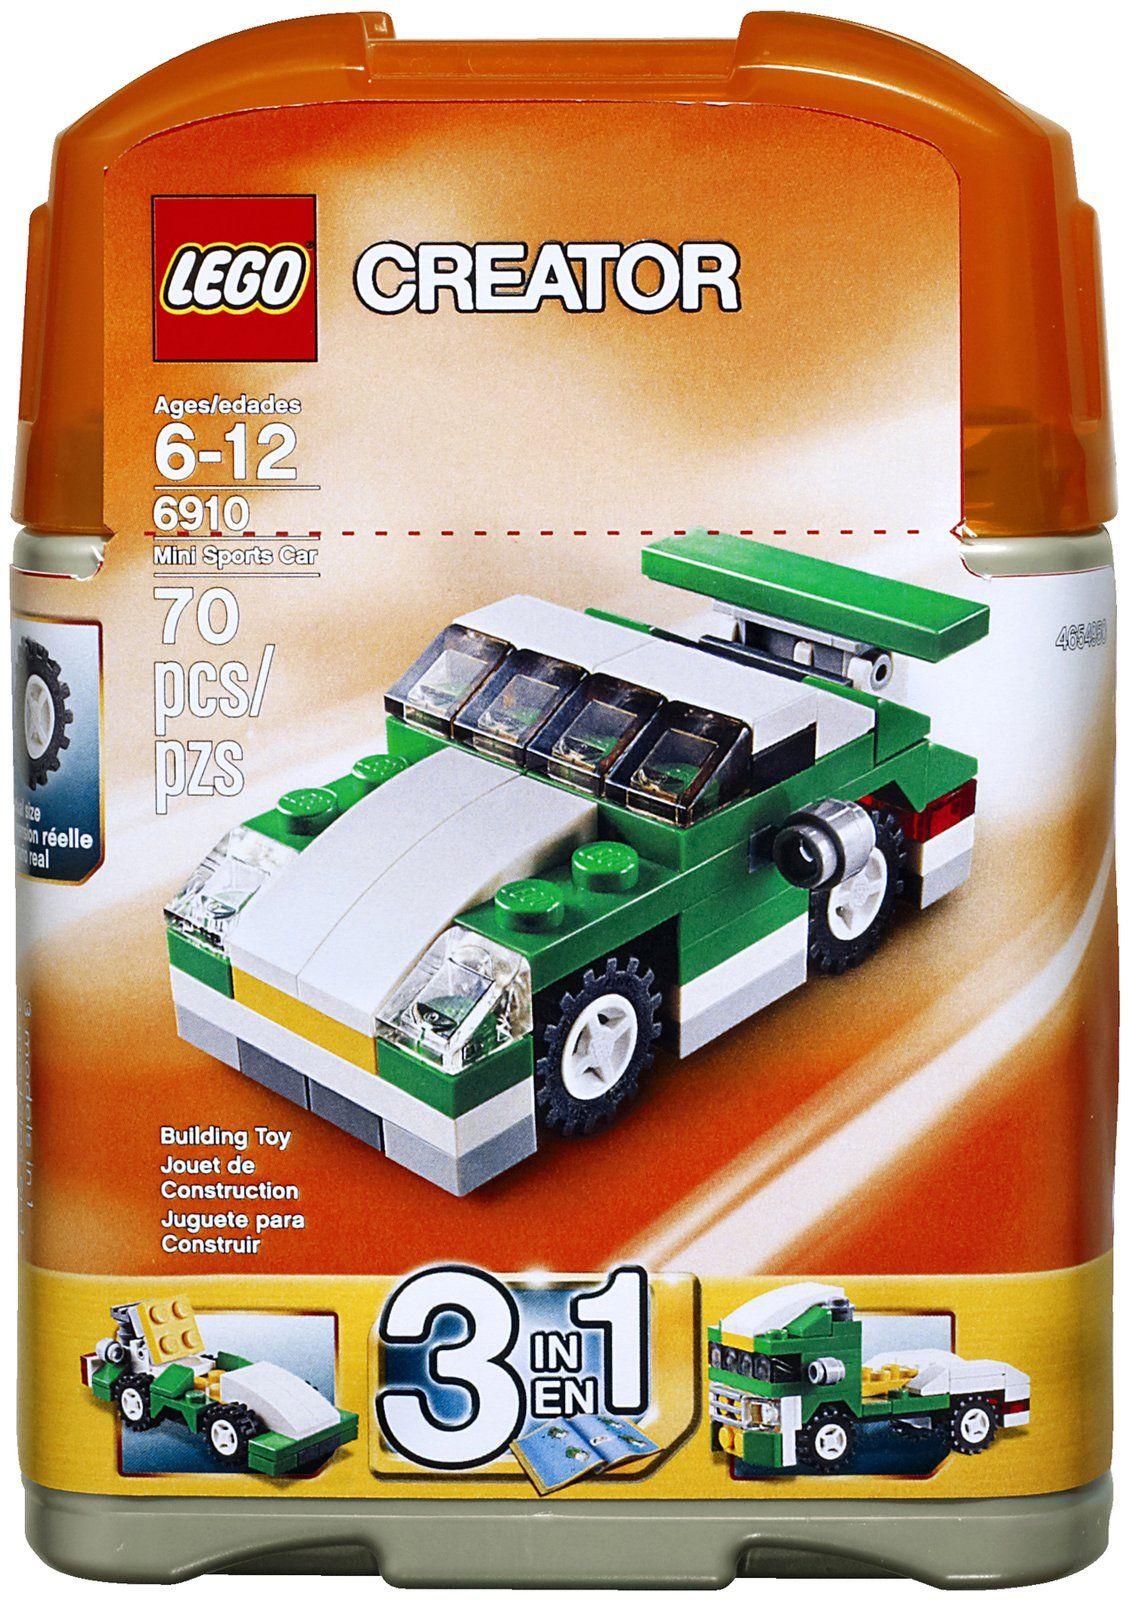 LEGO Creator Mini Sports Car 6910 Ready...go! Race through